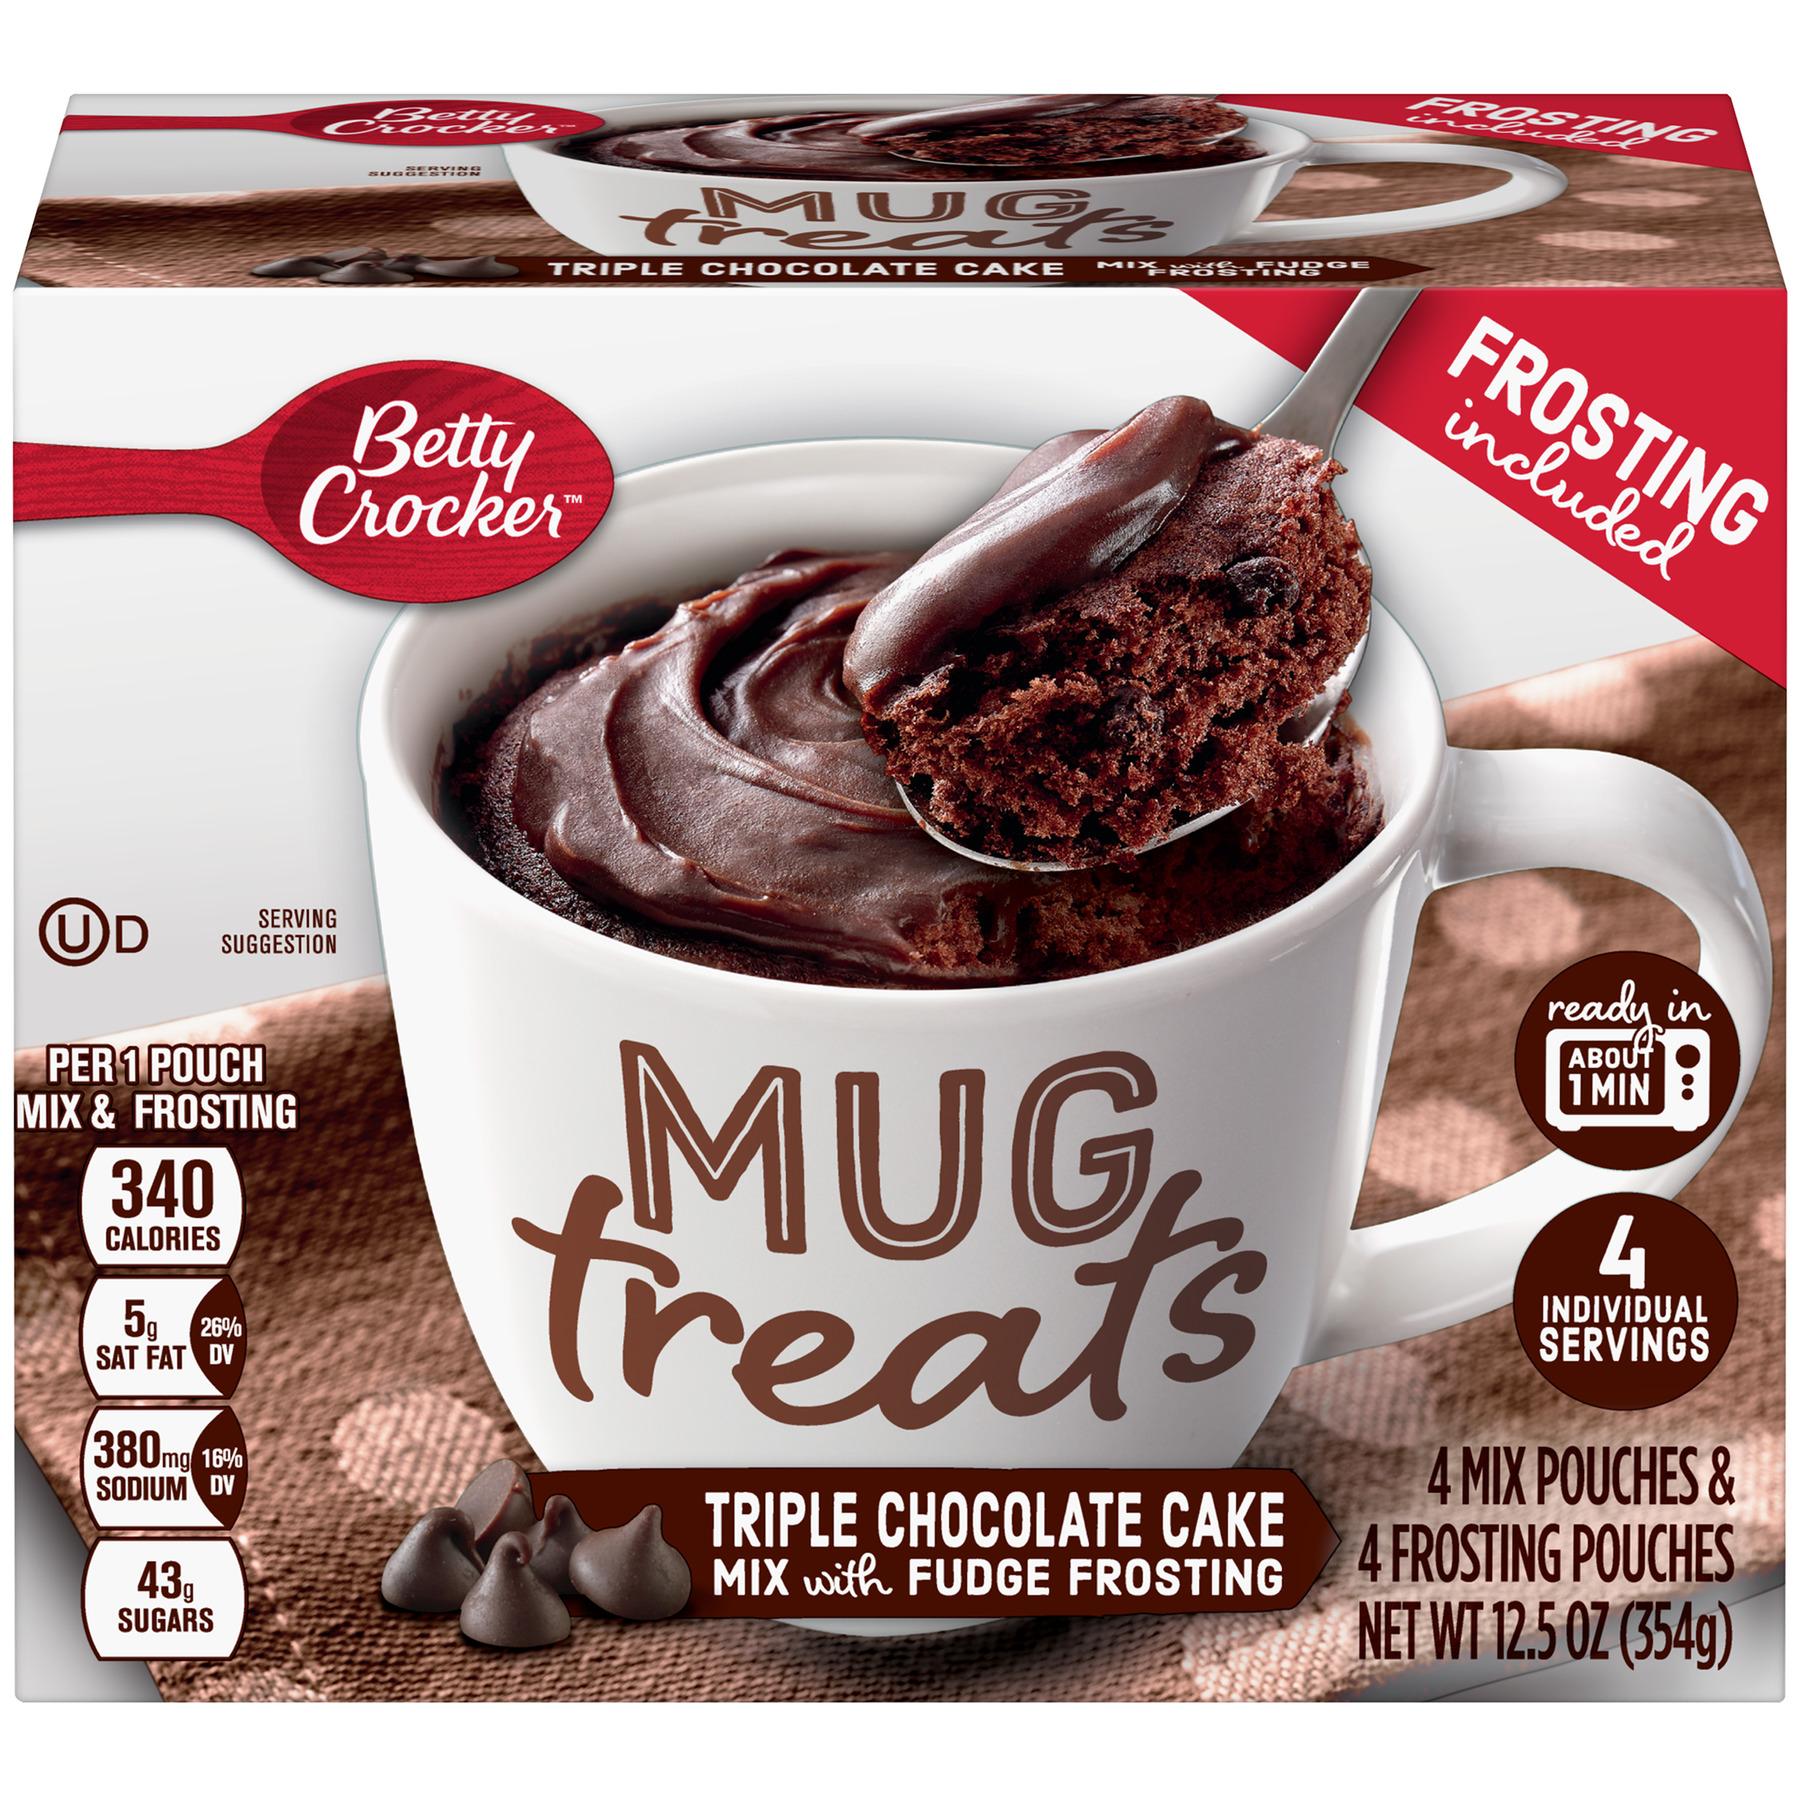 (6 Pack) Betty Crocker Mug Treats Triple Chocolate Cake 12.5 oz Box